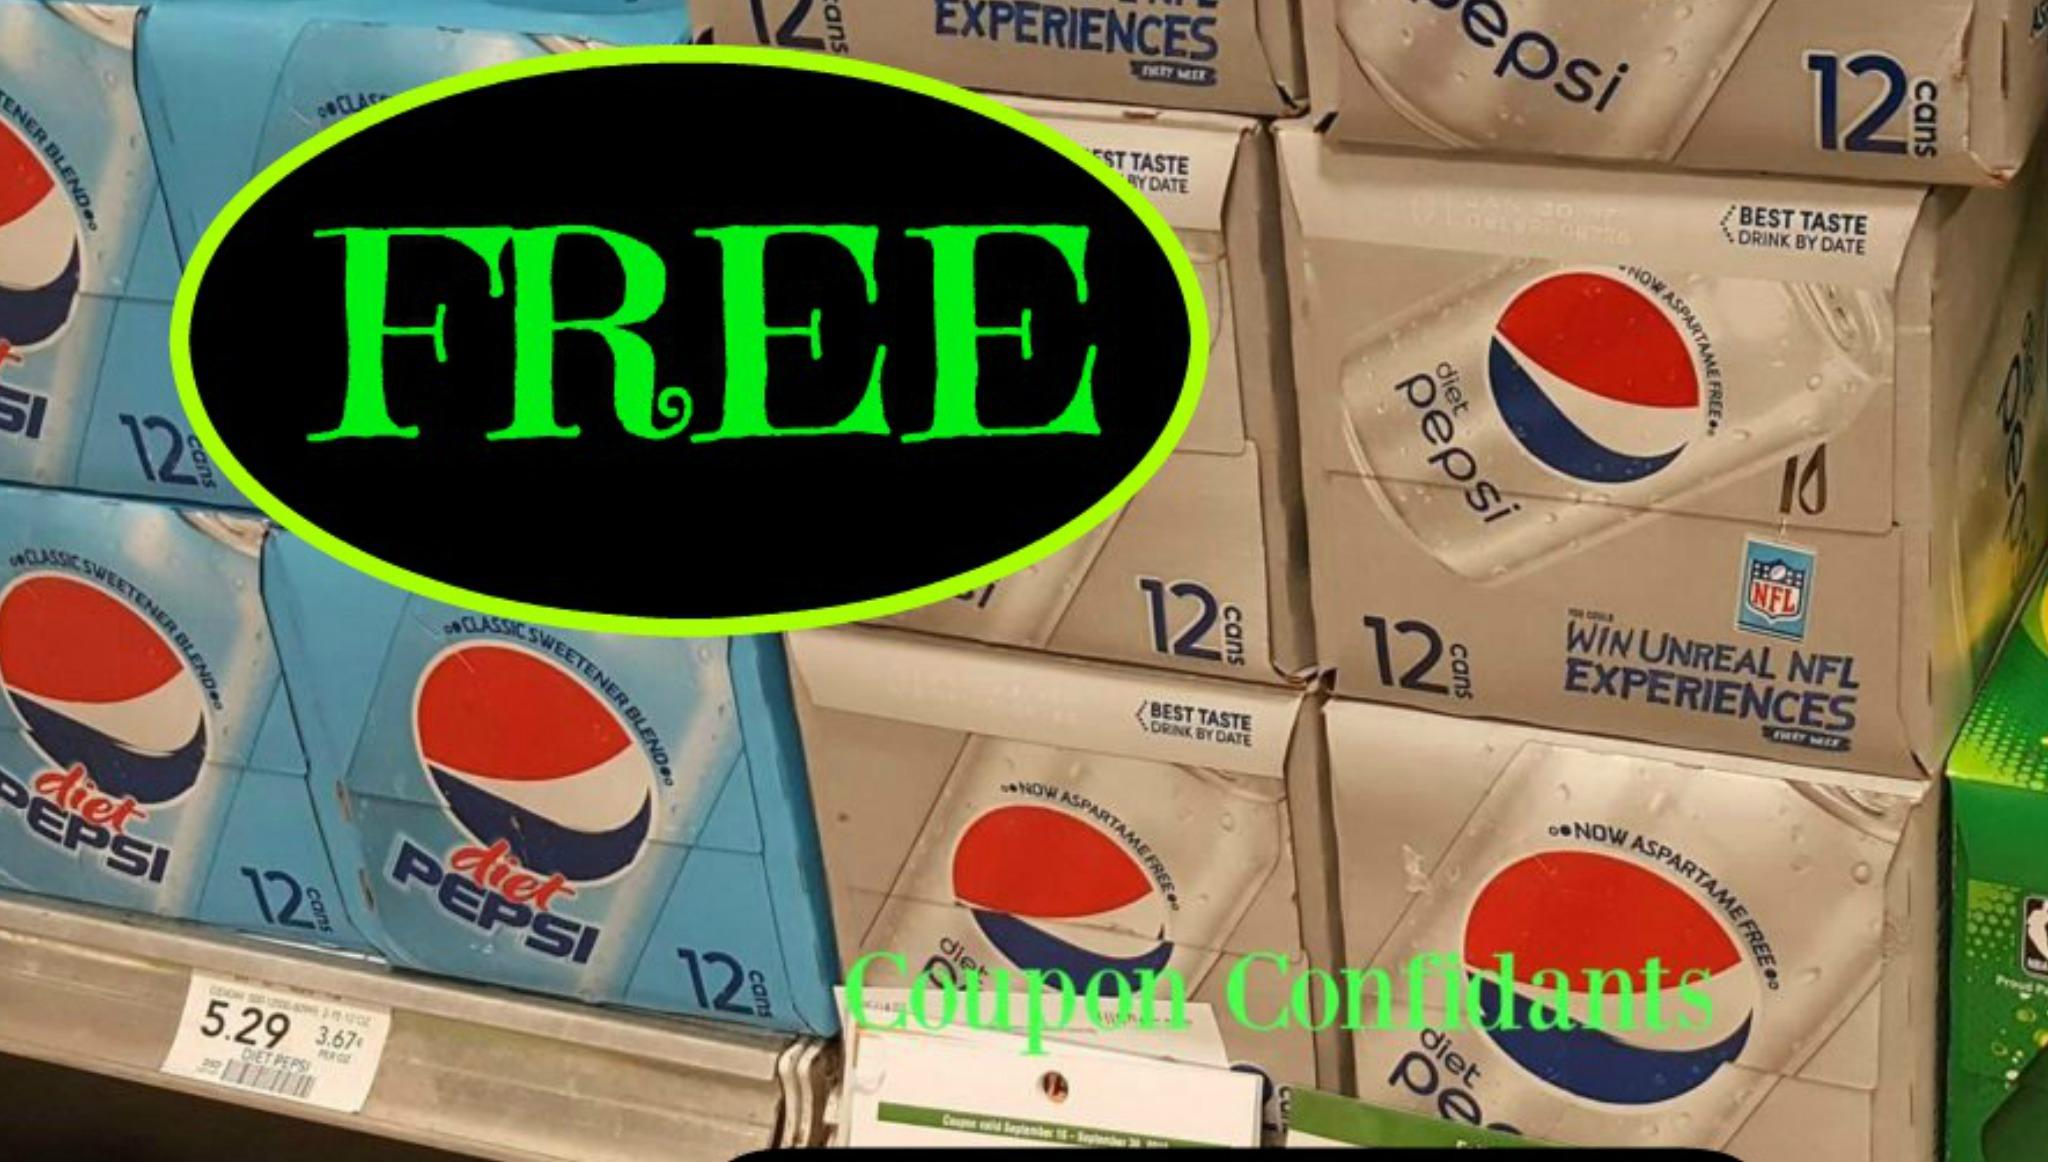 Free Diet Pepsi Or Pepsi Zero Sugar 12 Pks At Publix Today Only